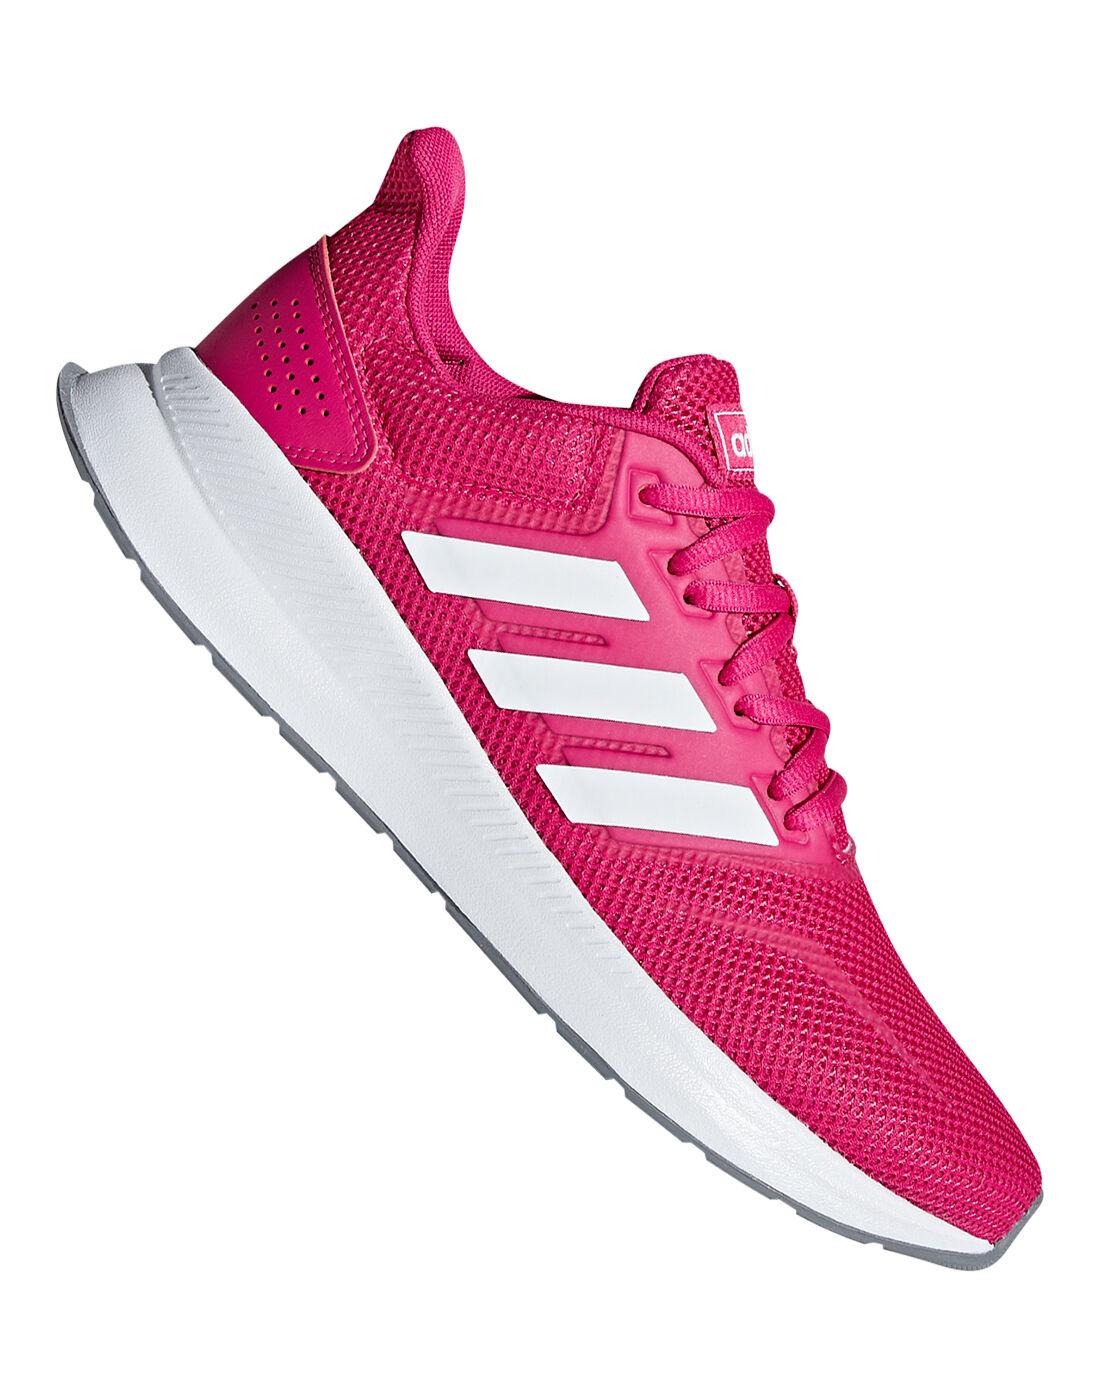 Women's Pink adidas Falcon | Life Style Sports